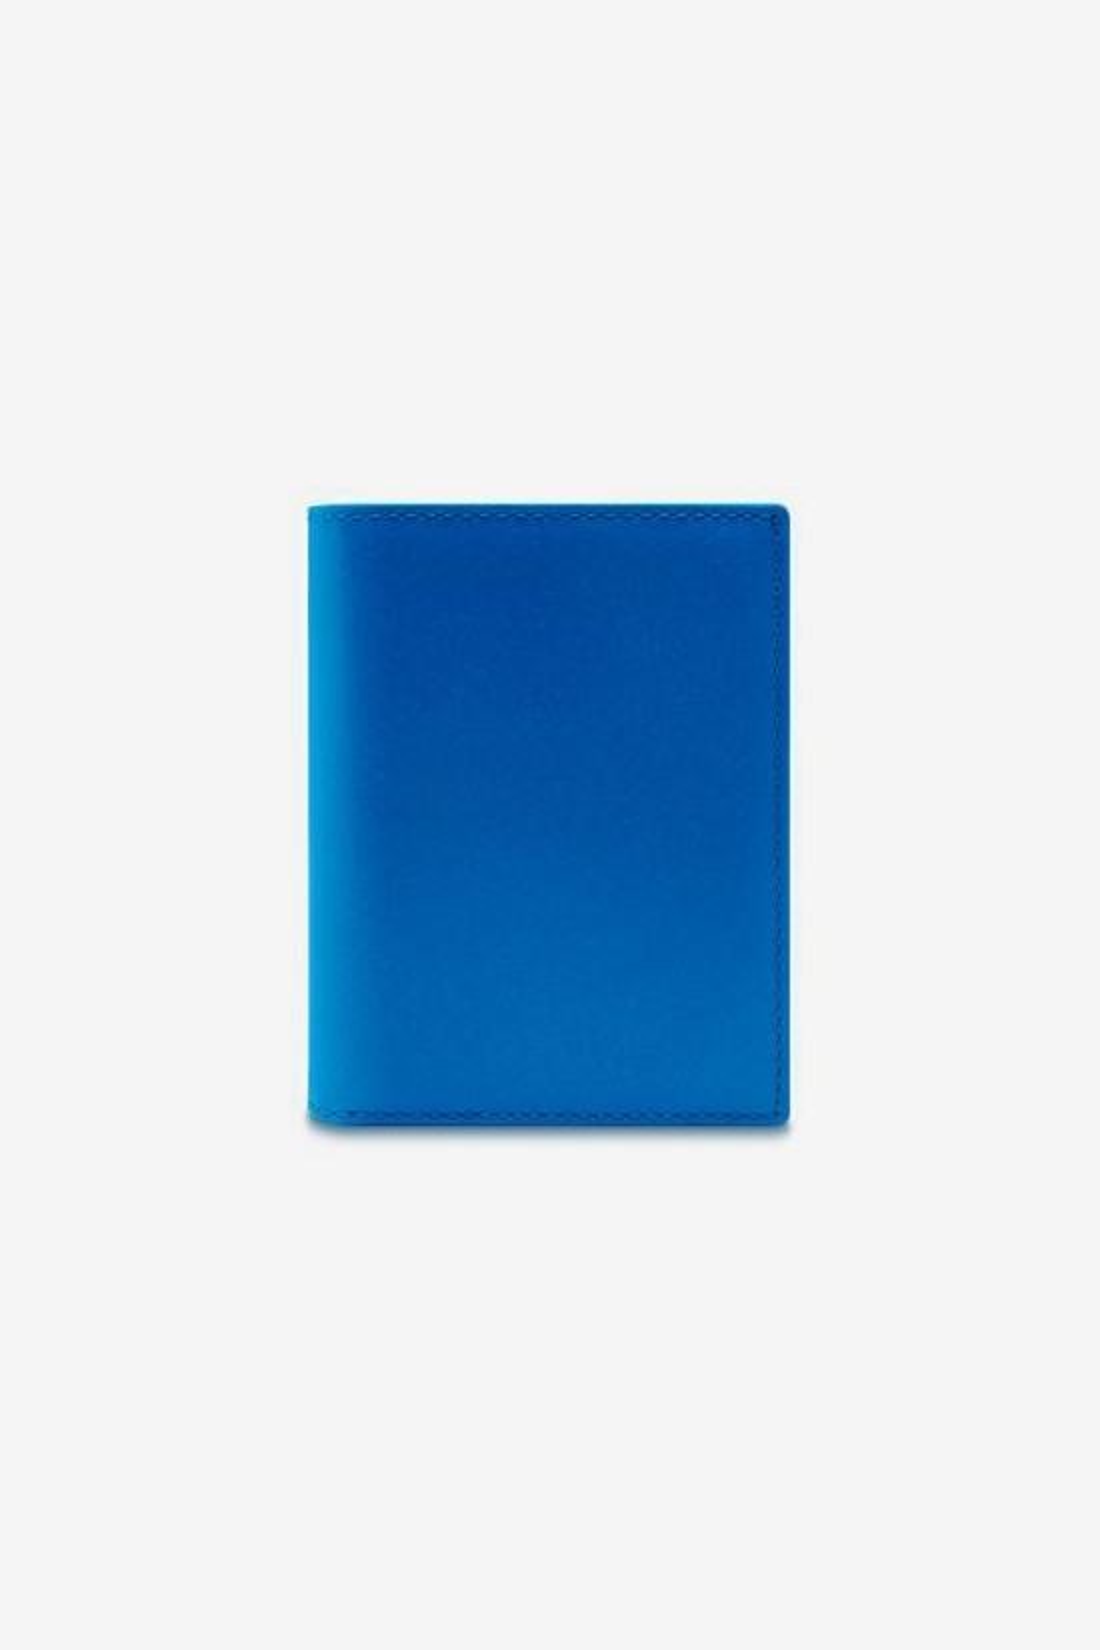 COMME DES GARÇONS WALLETS / Cdg super fluo sa0641sf Blue green